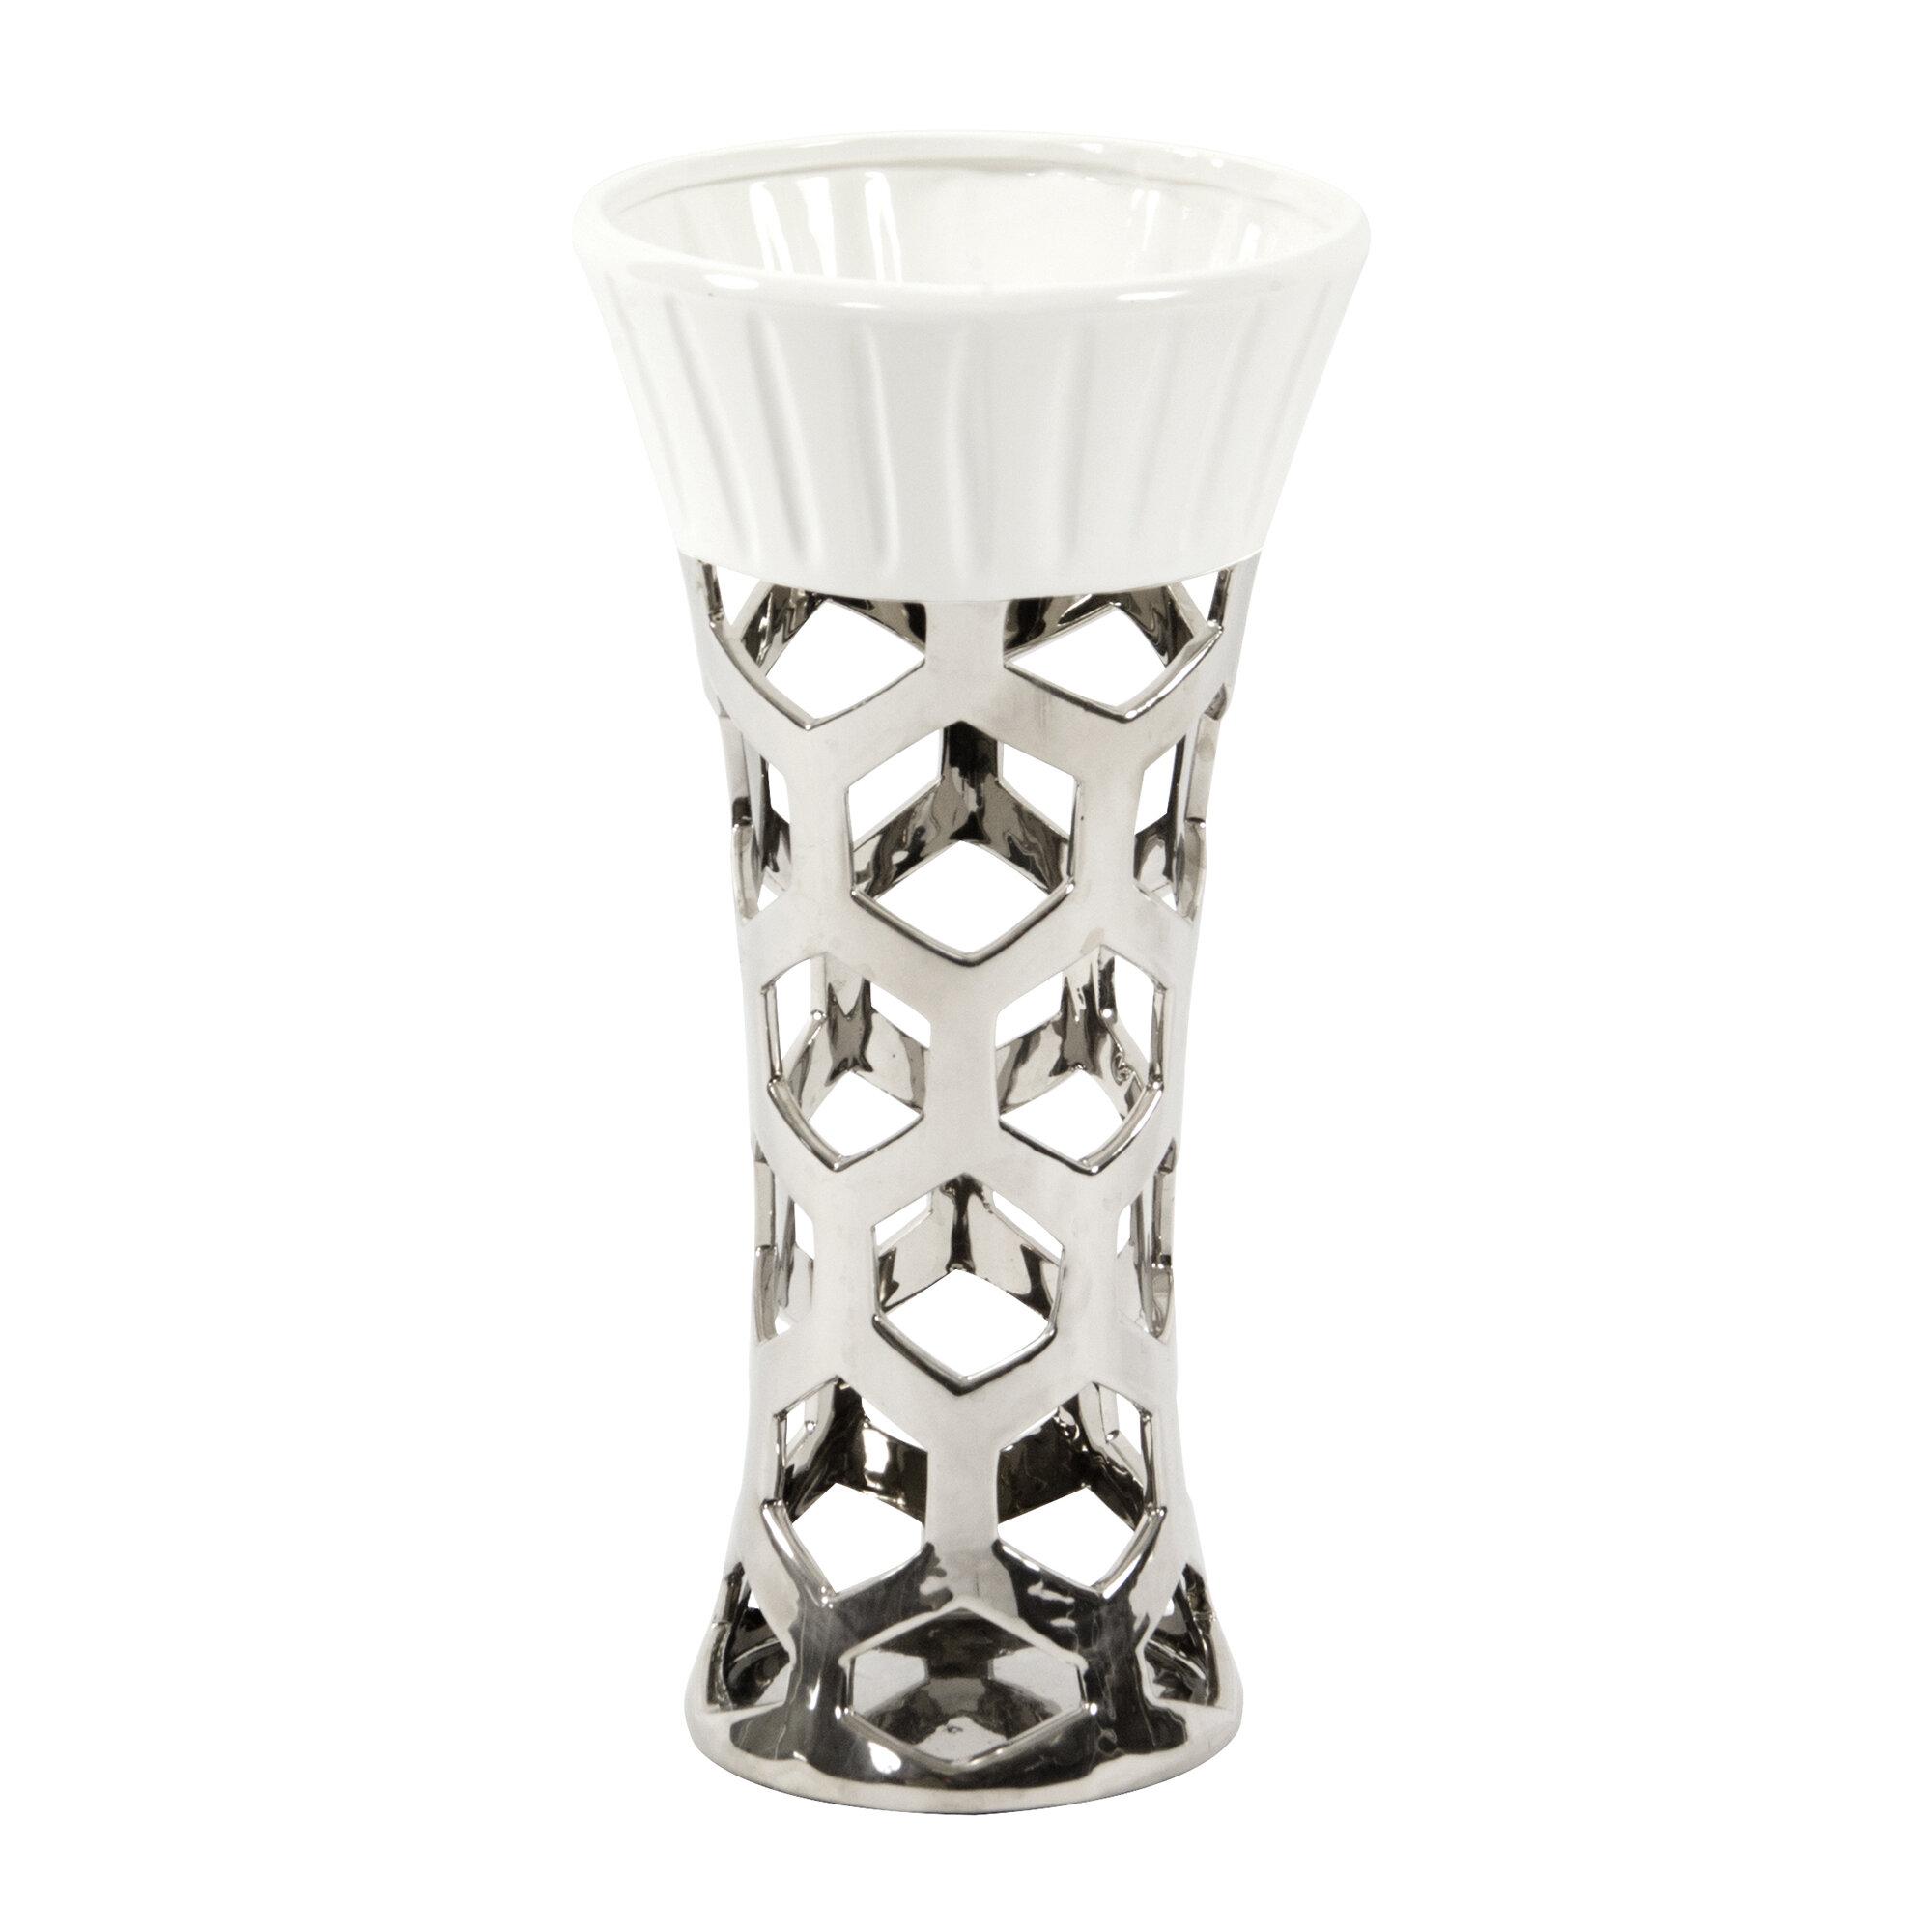 Orren Ellis Laverock Hexagon Cut Out Ceramic Table Vase Wayfair